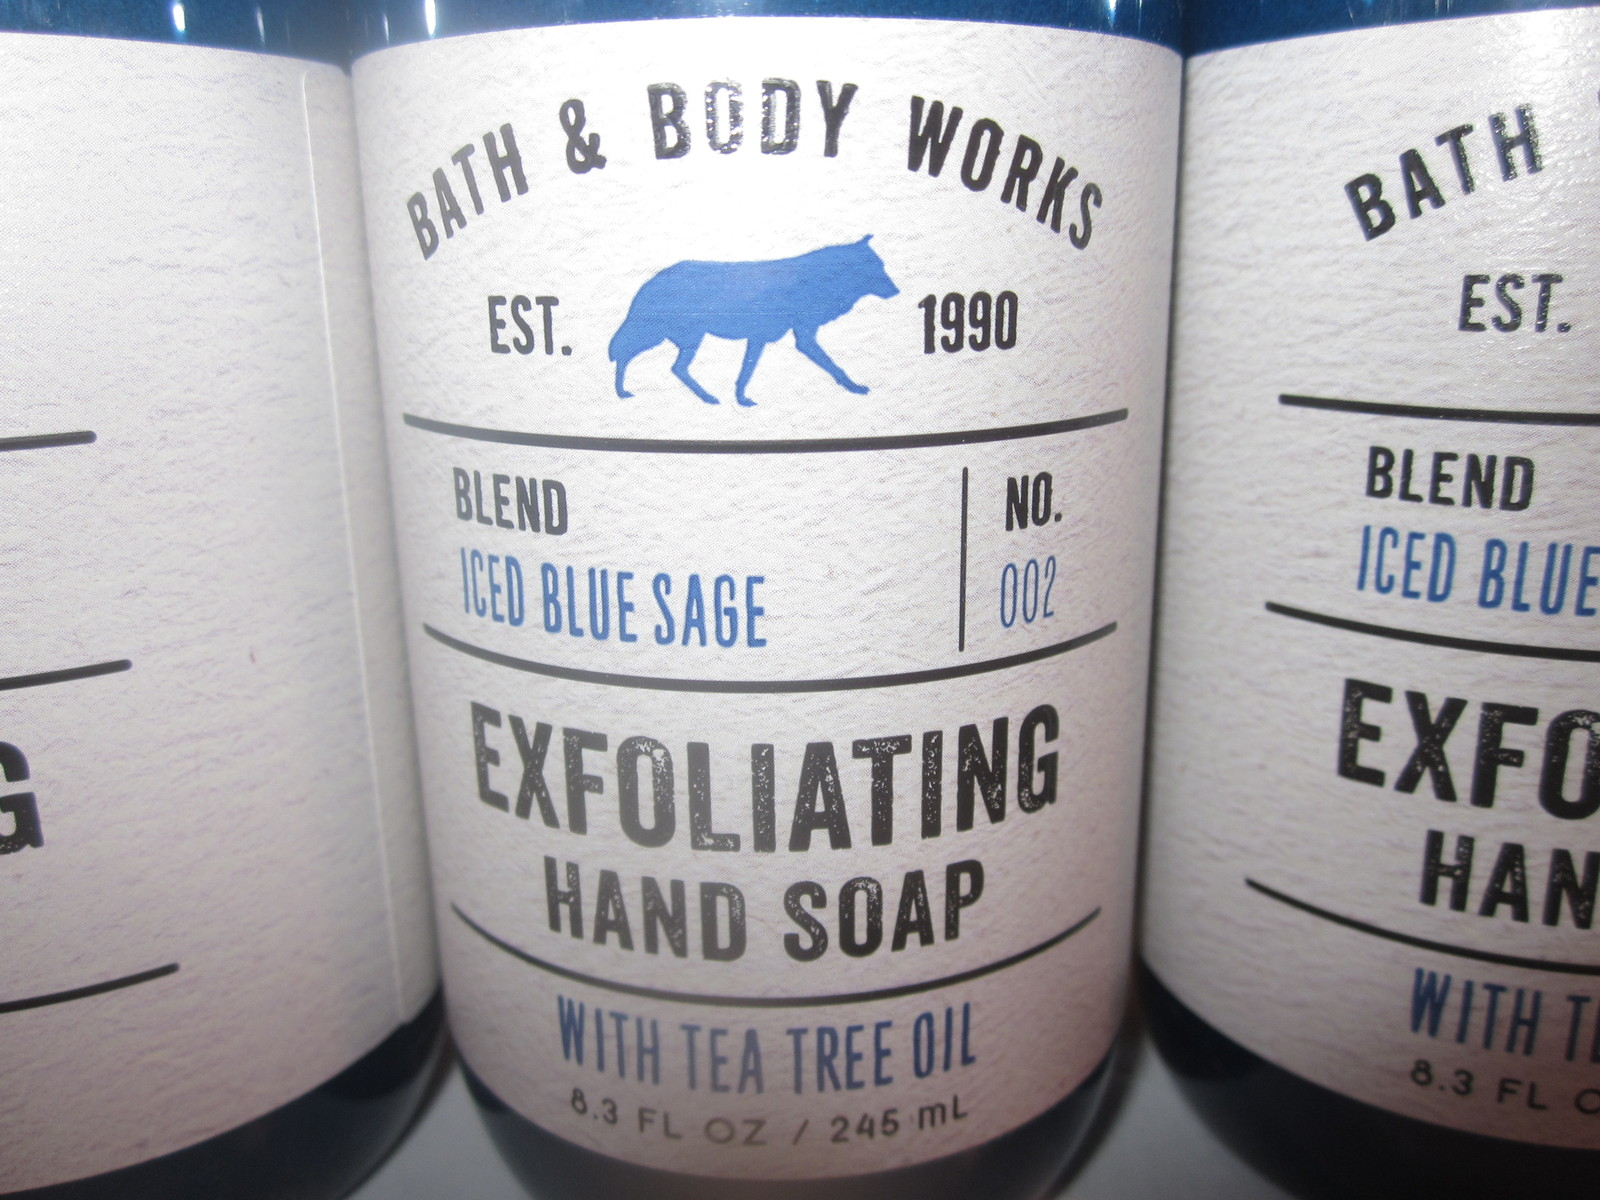 3 bottles Bath & Body Works Exfoliating Hand Soap Iced Blue Sage image 2